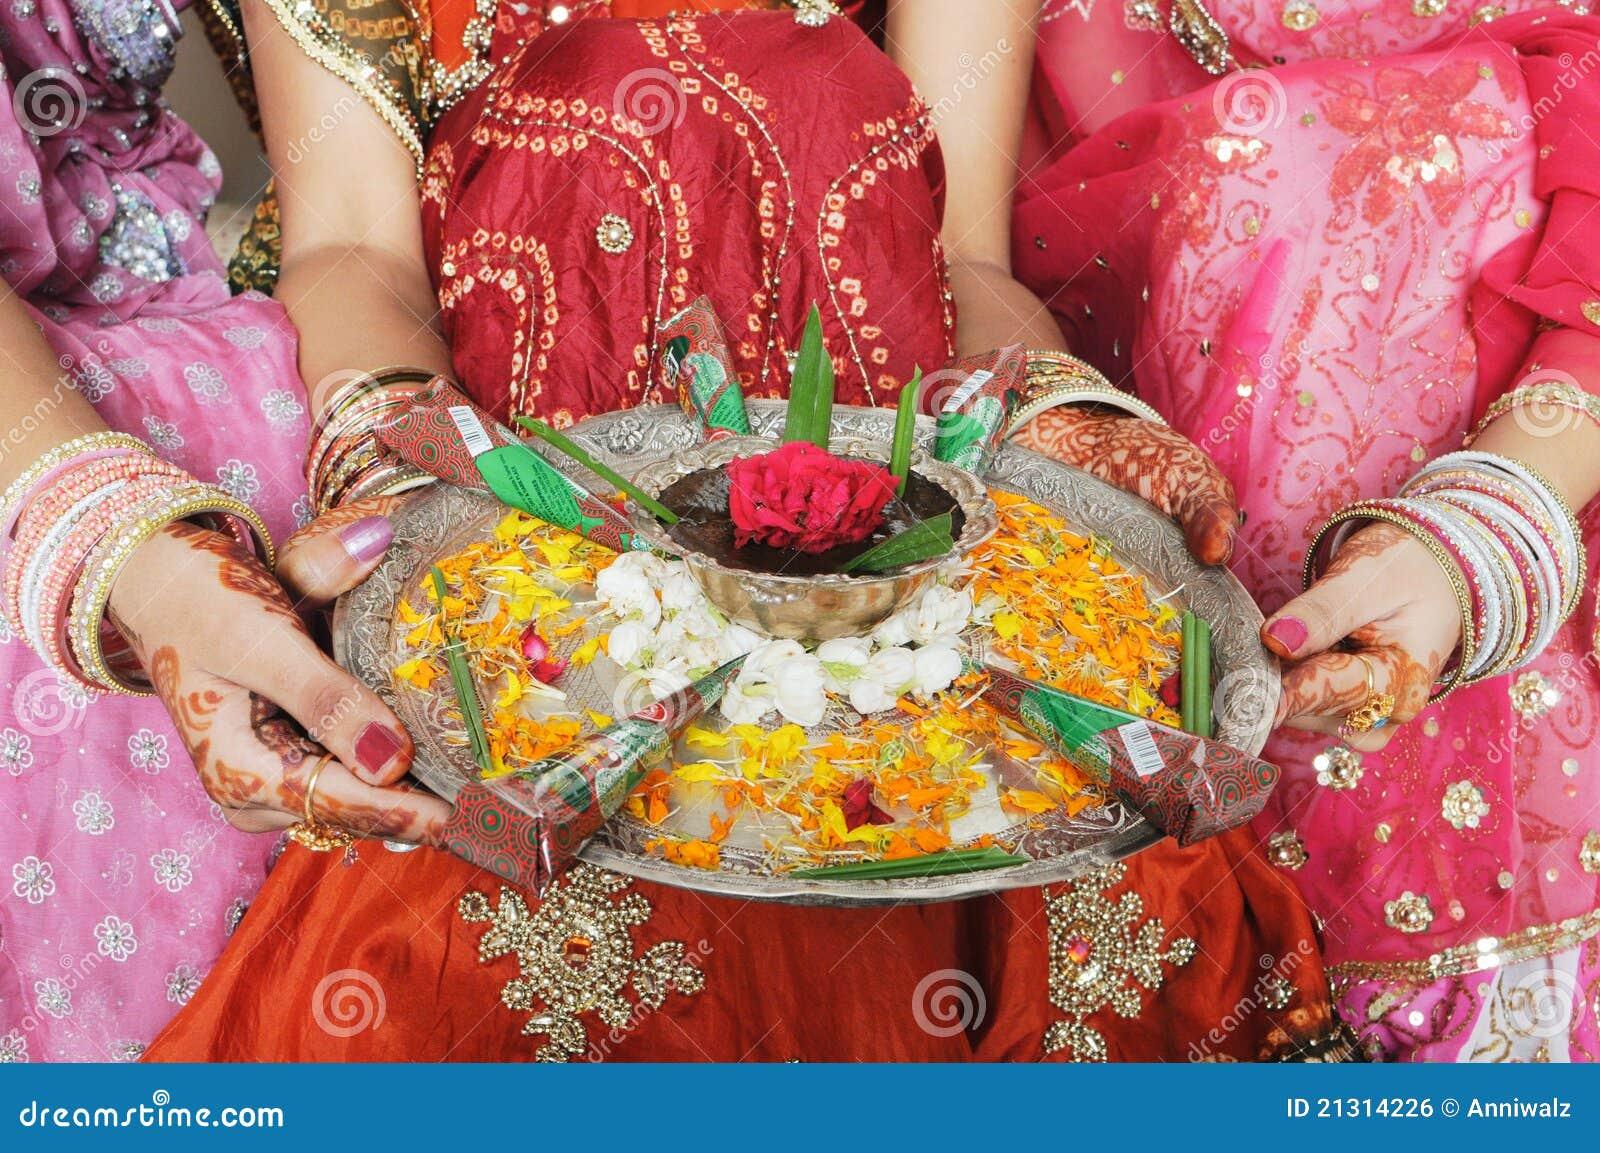 Blog Entries 1 & Mehndi Event and Mehndi Plate Decorating Ideas